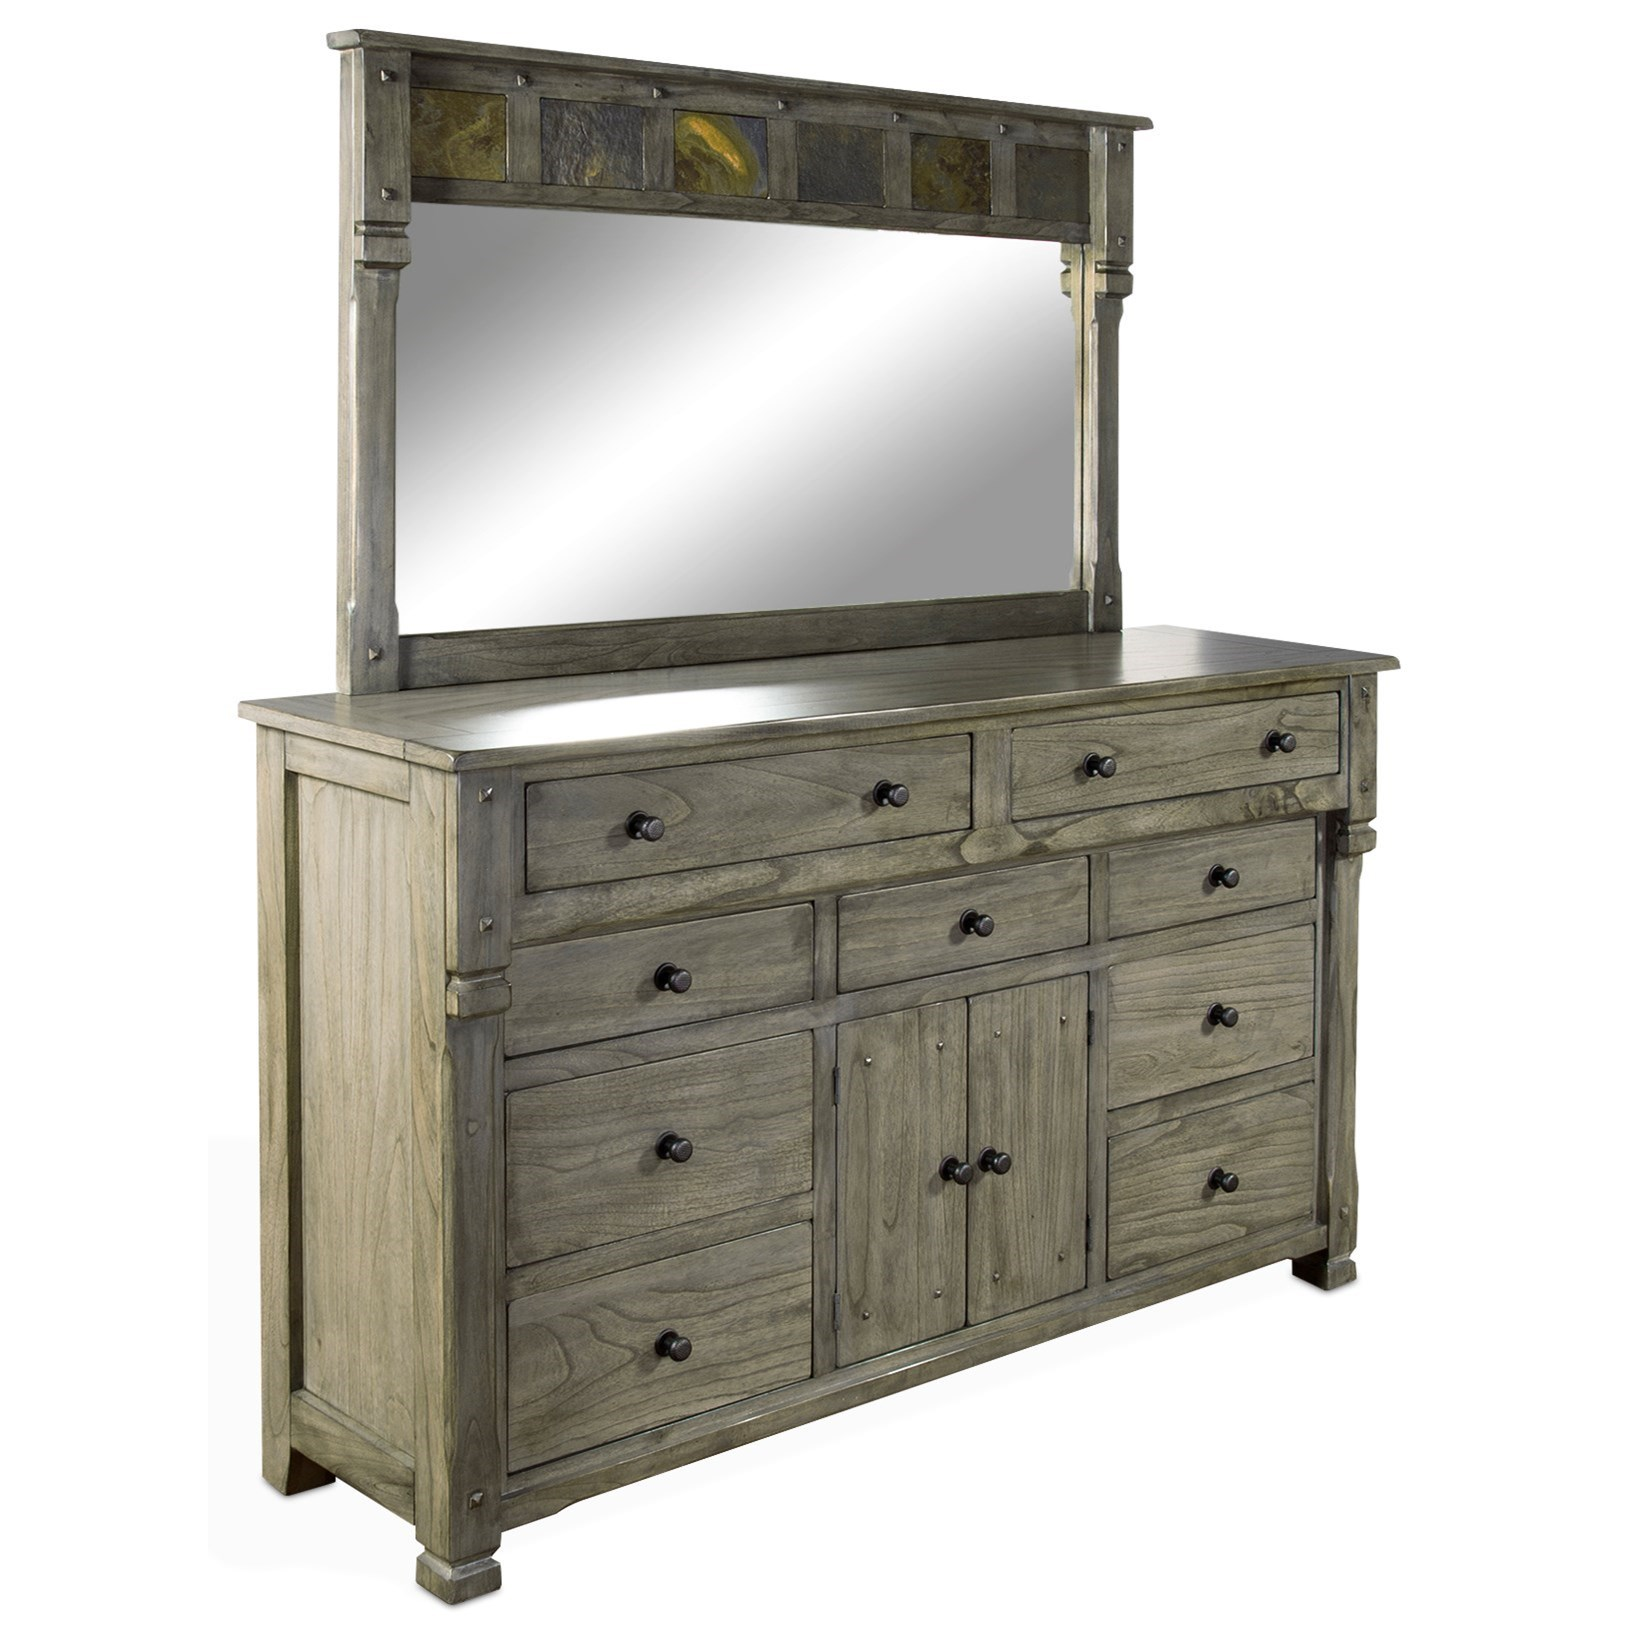 Sunny Designs Scottsdale Dresser Mirror With Slate Tile